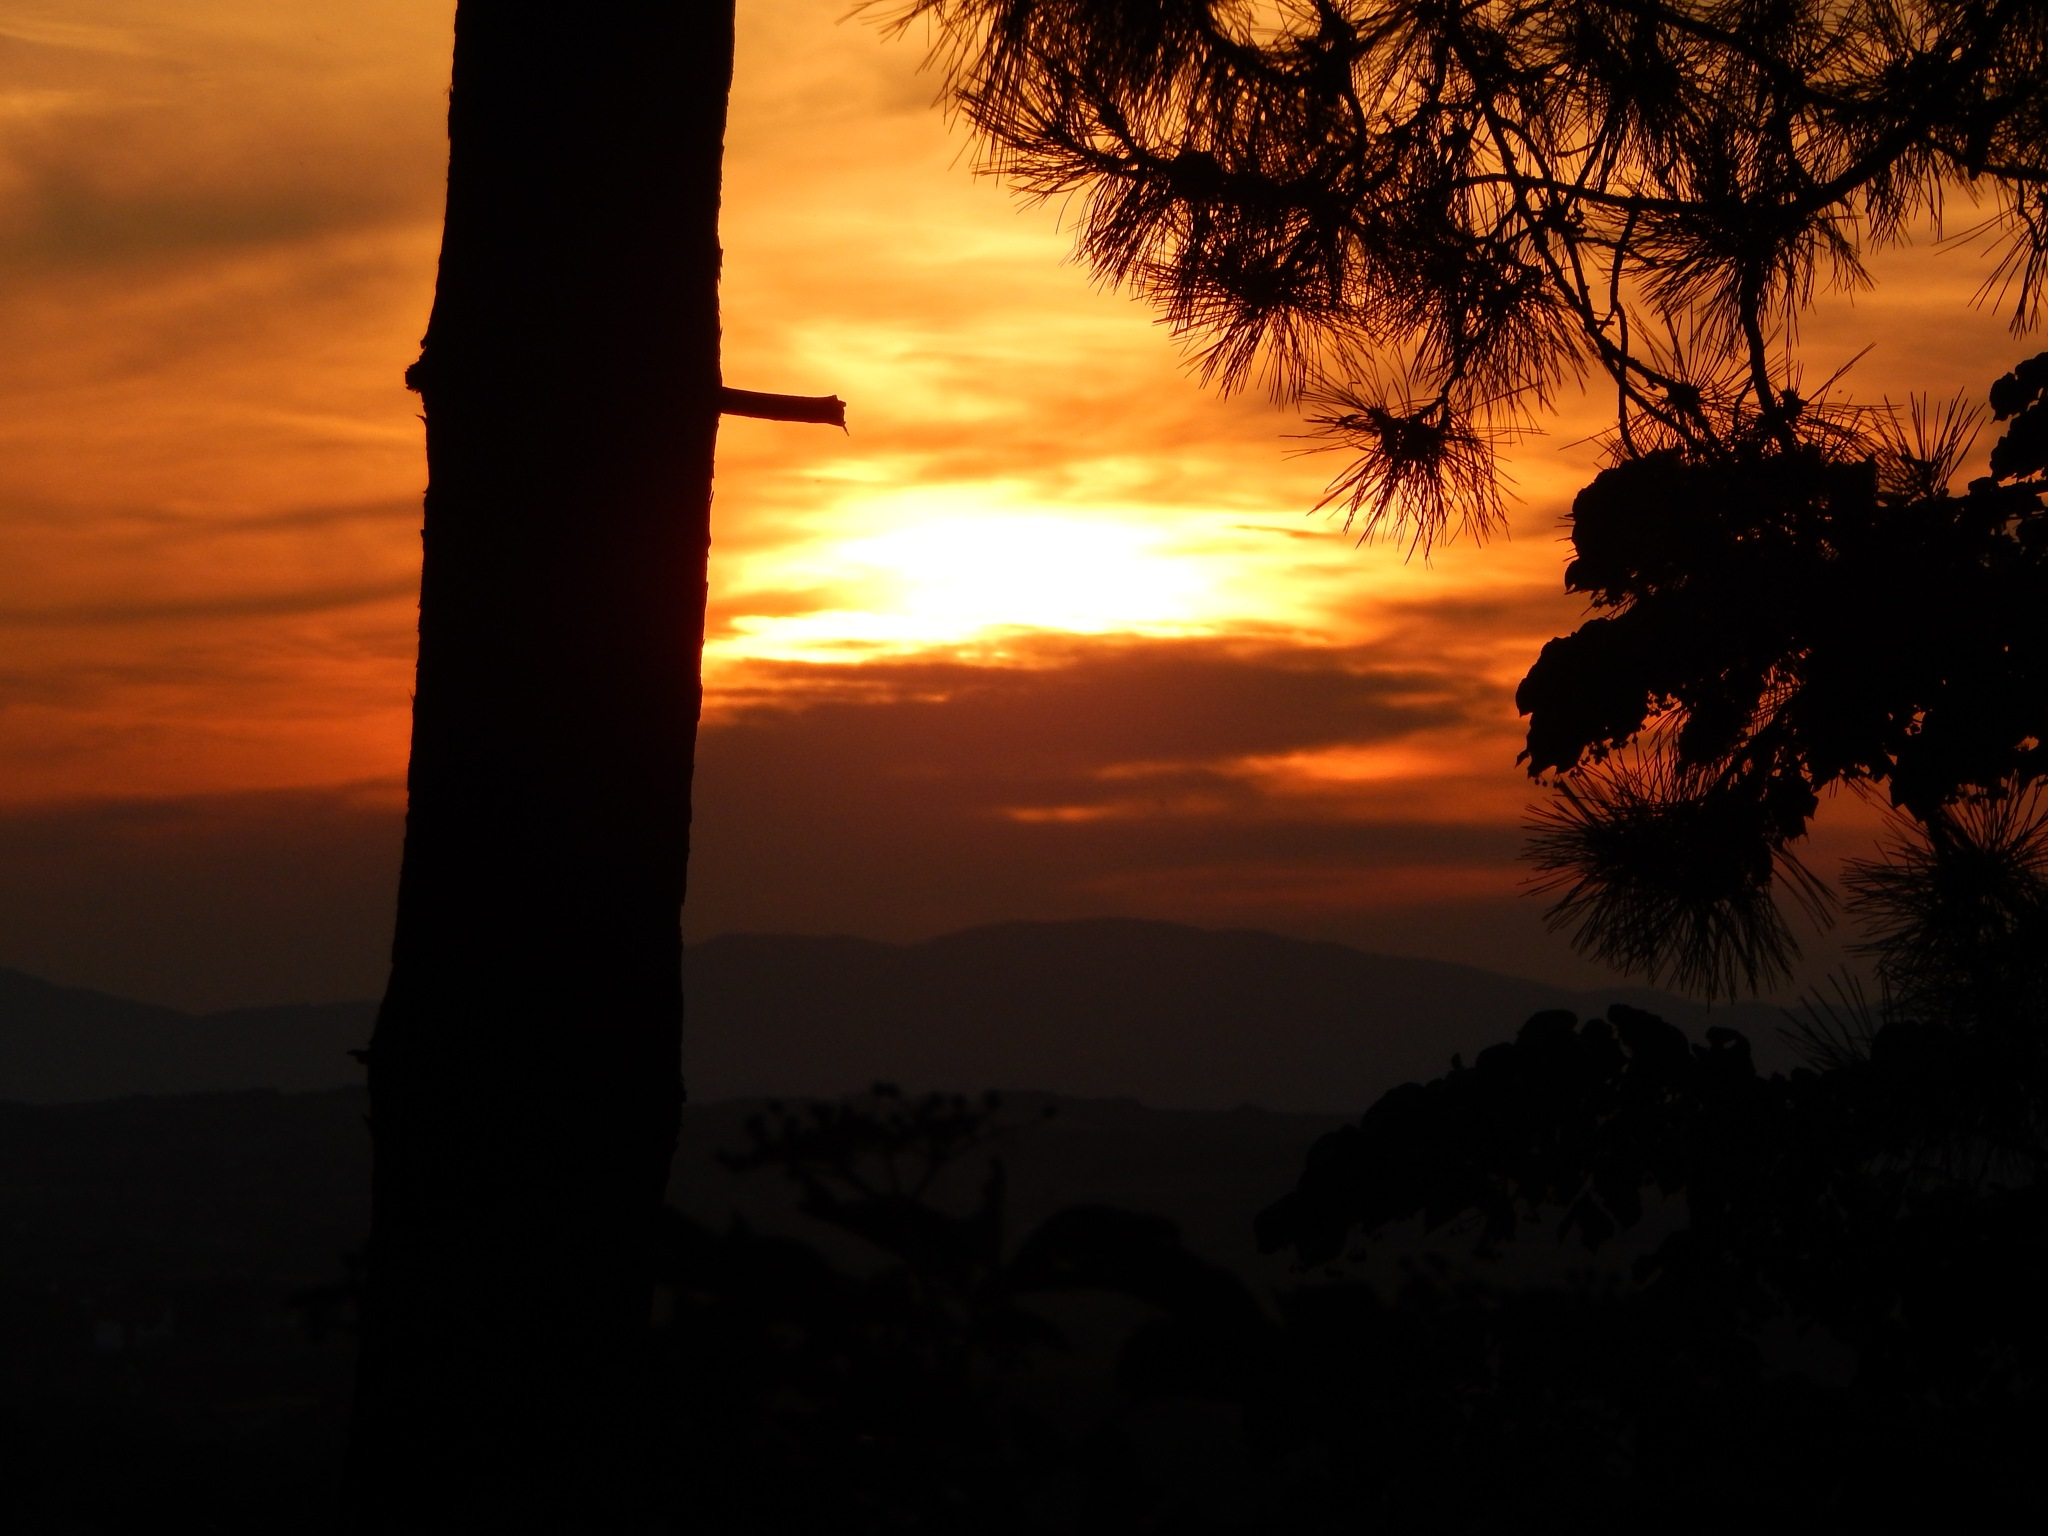 Sunset by Ilija Krstic